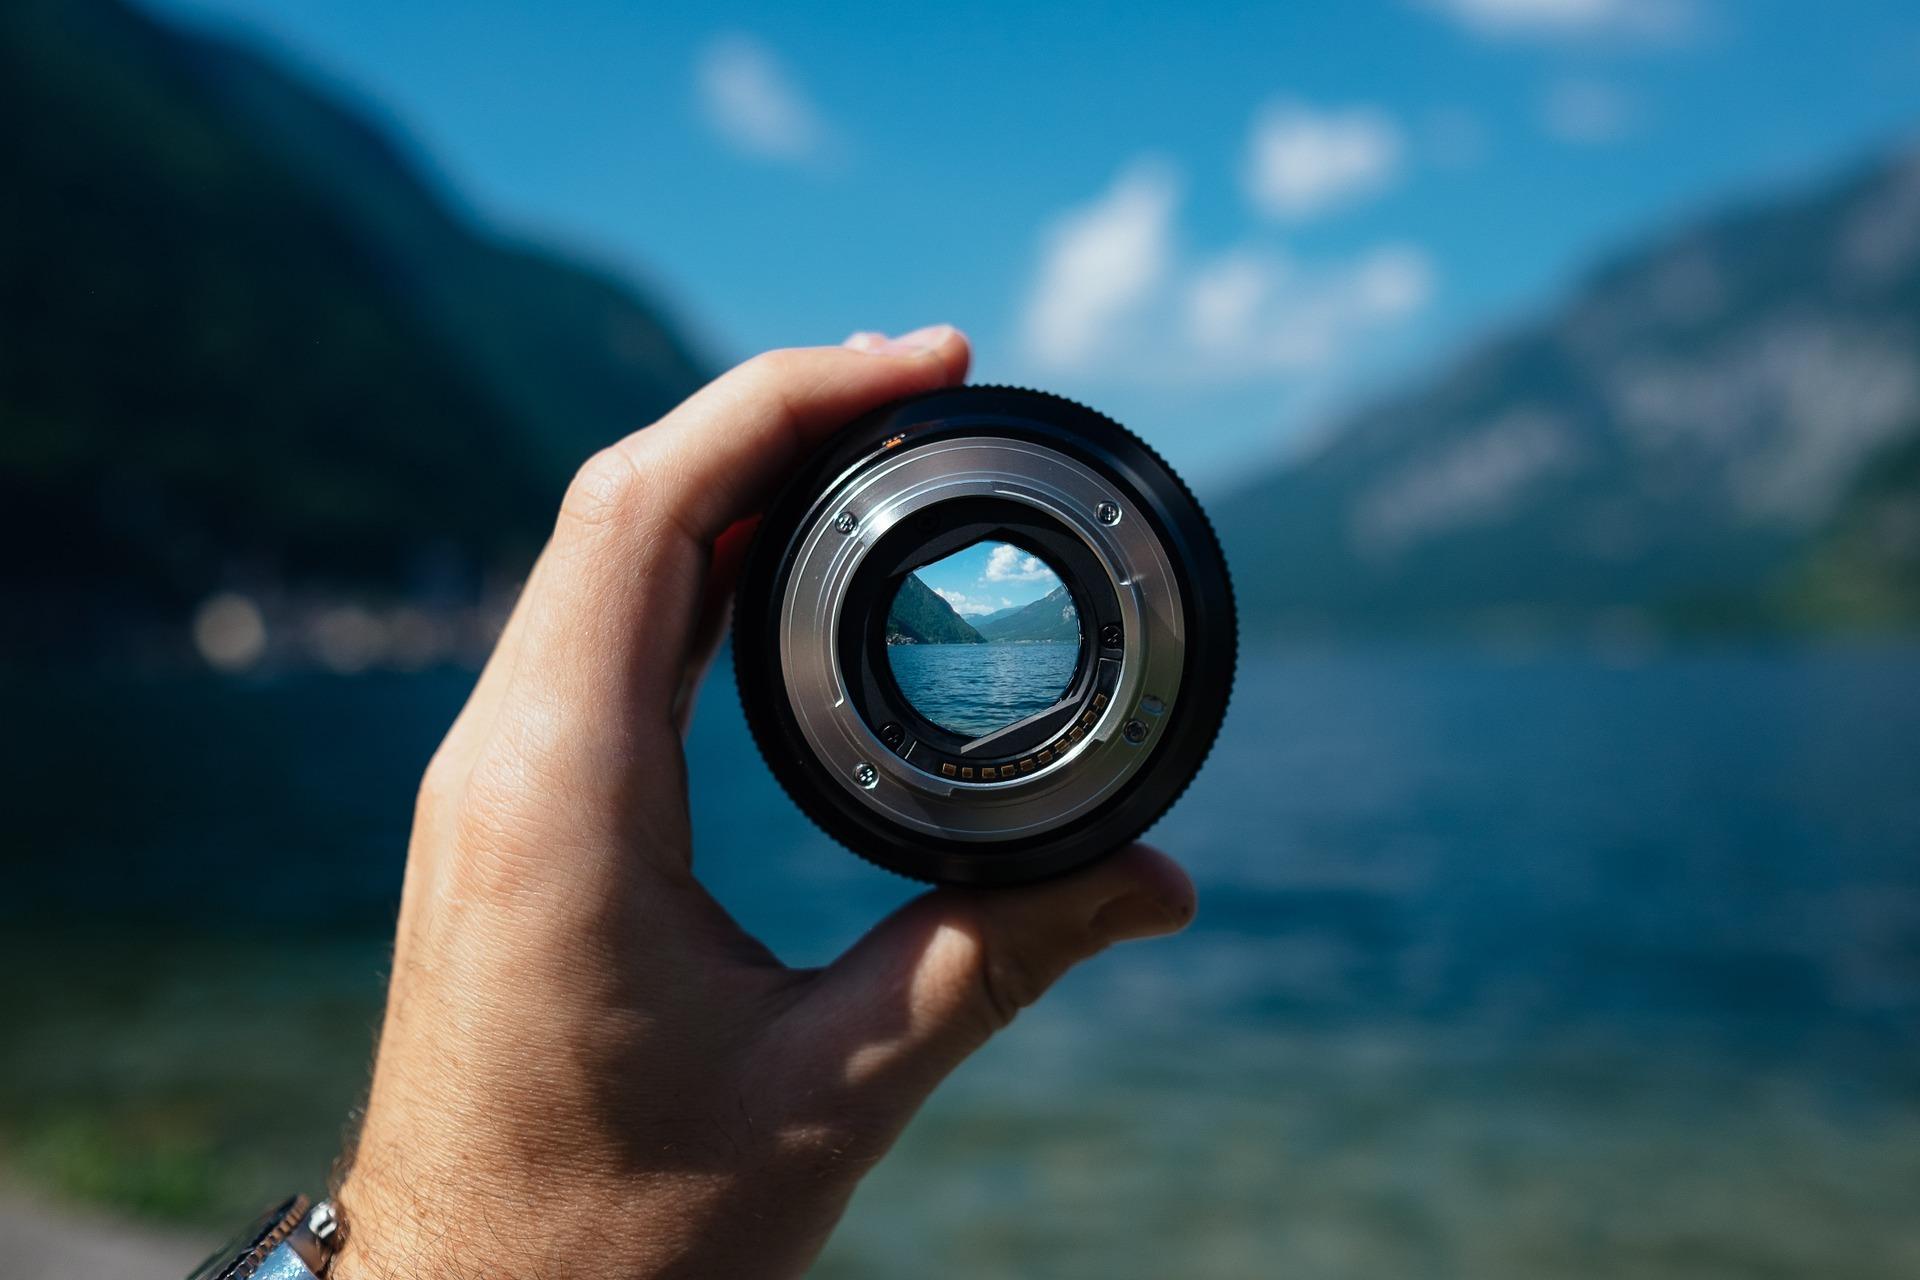 Hypnotherapy, Hypnosis, Focus on Your Dreams